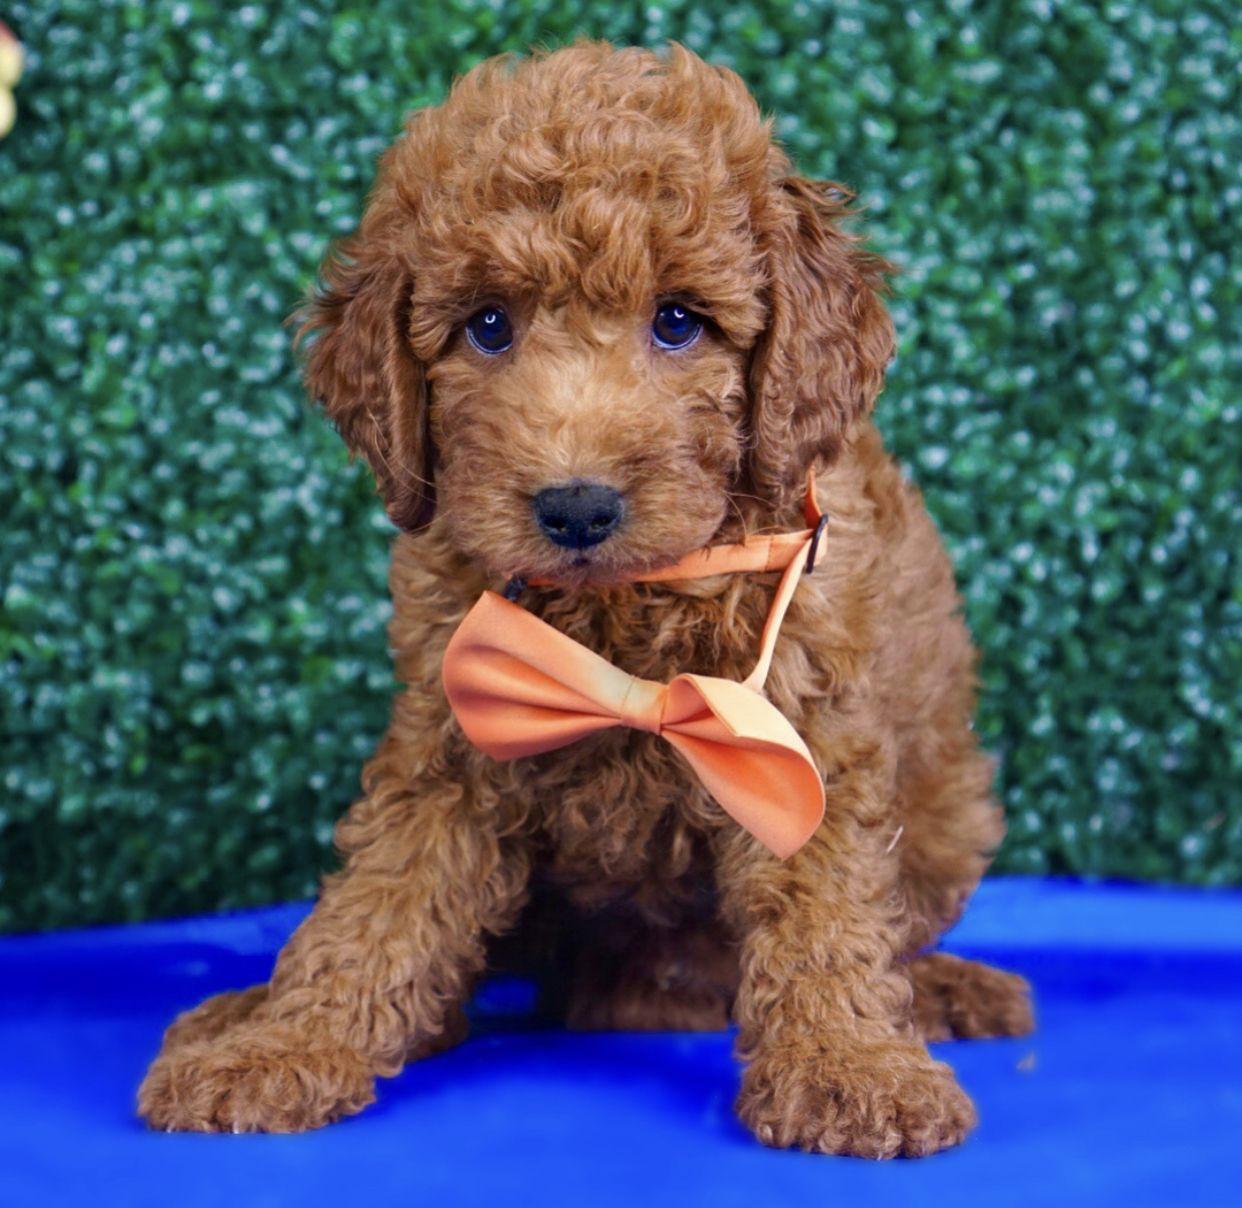 Goldendoodle Labradoodle Labradorretriever Goldenretriever Puppies Puppy Teddybeardog Doodlepuppy Adora In 2020 Goldendoodle Teddy Bear Puppies Teddy Bear Dog